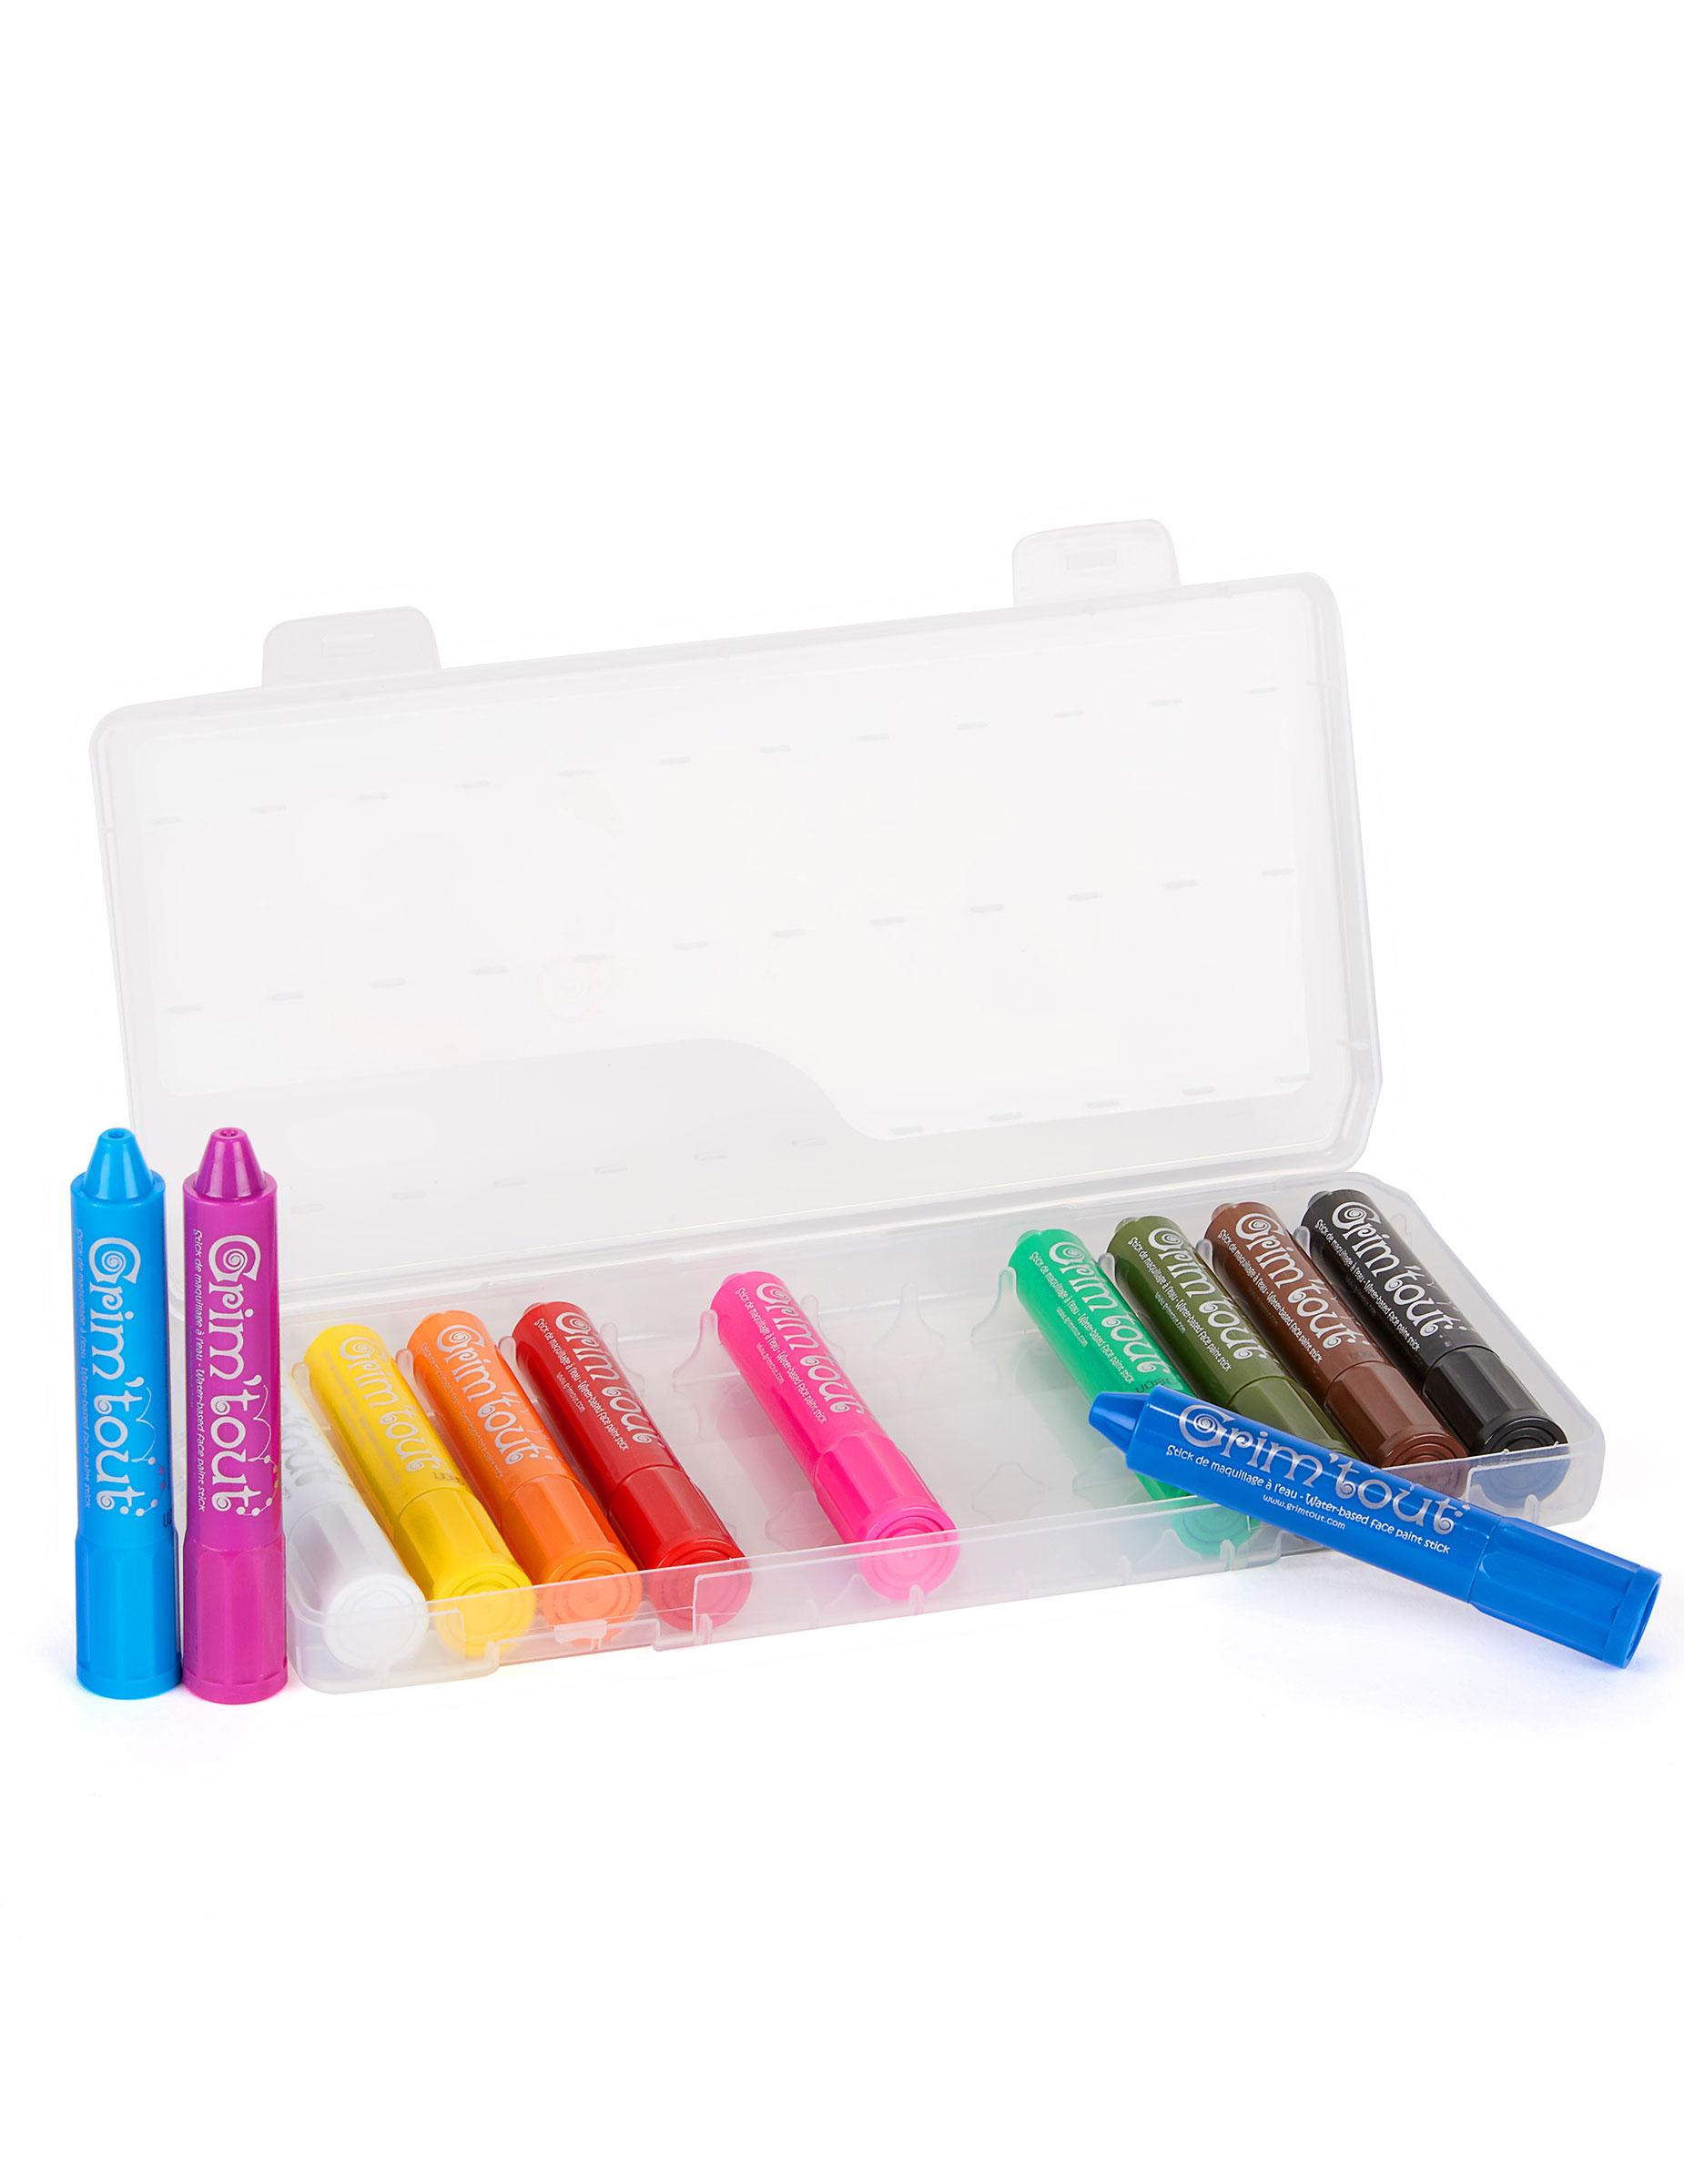 bo te de 12 crayons maquillage multicolore grim 39 tout. Black Bedroom Furniture Sets. Home Design Ideas